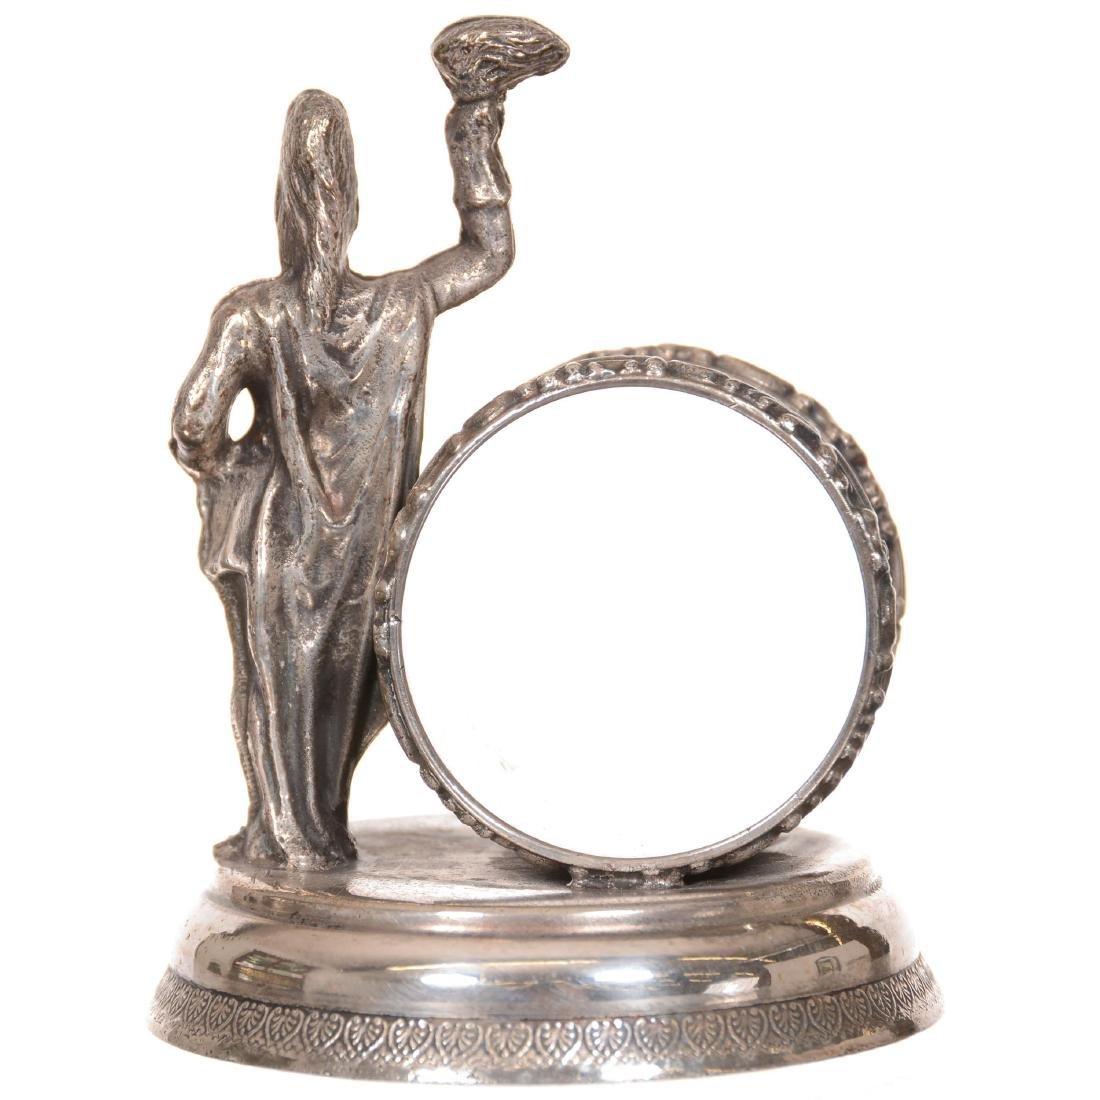 Victorian Silverplate Napkin Ring - 2